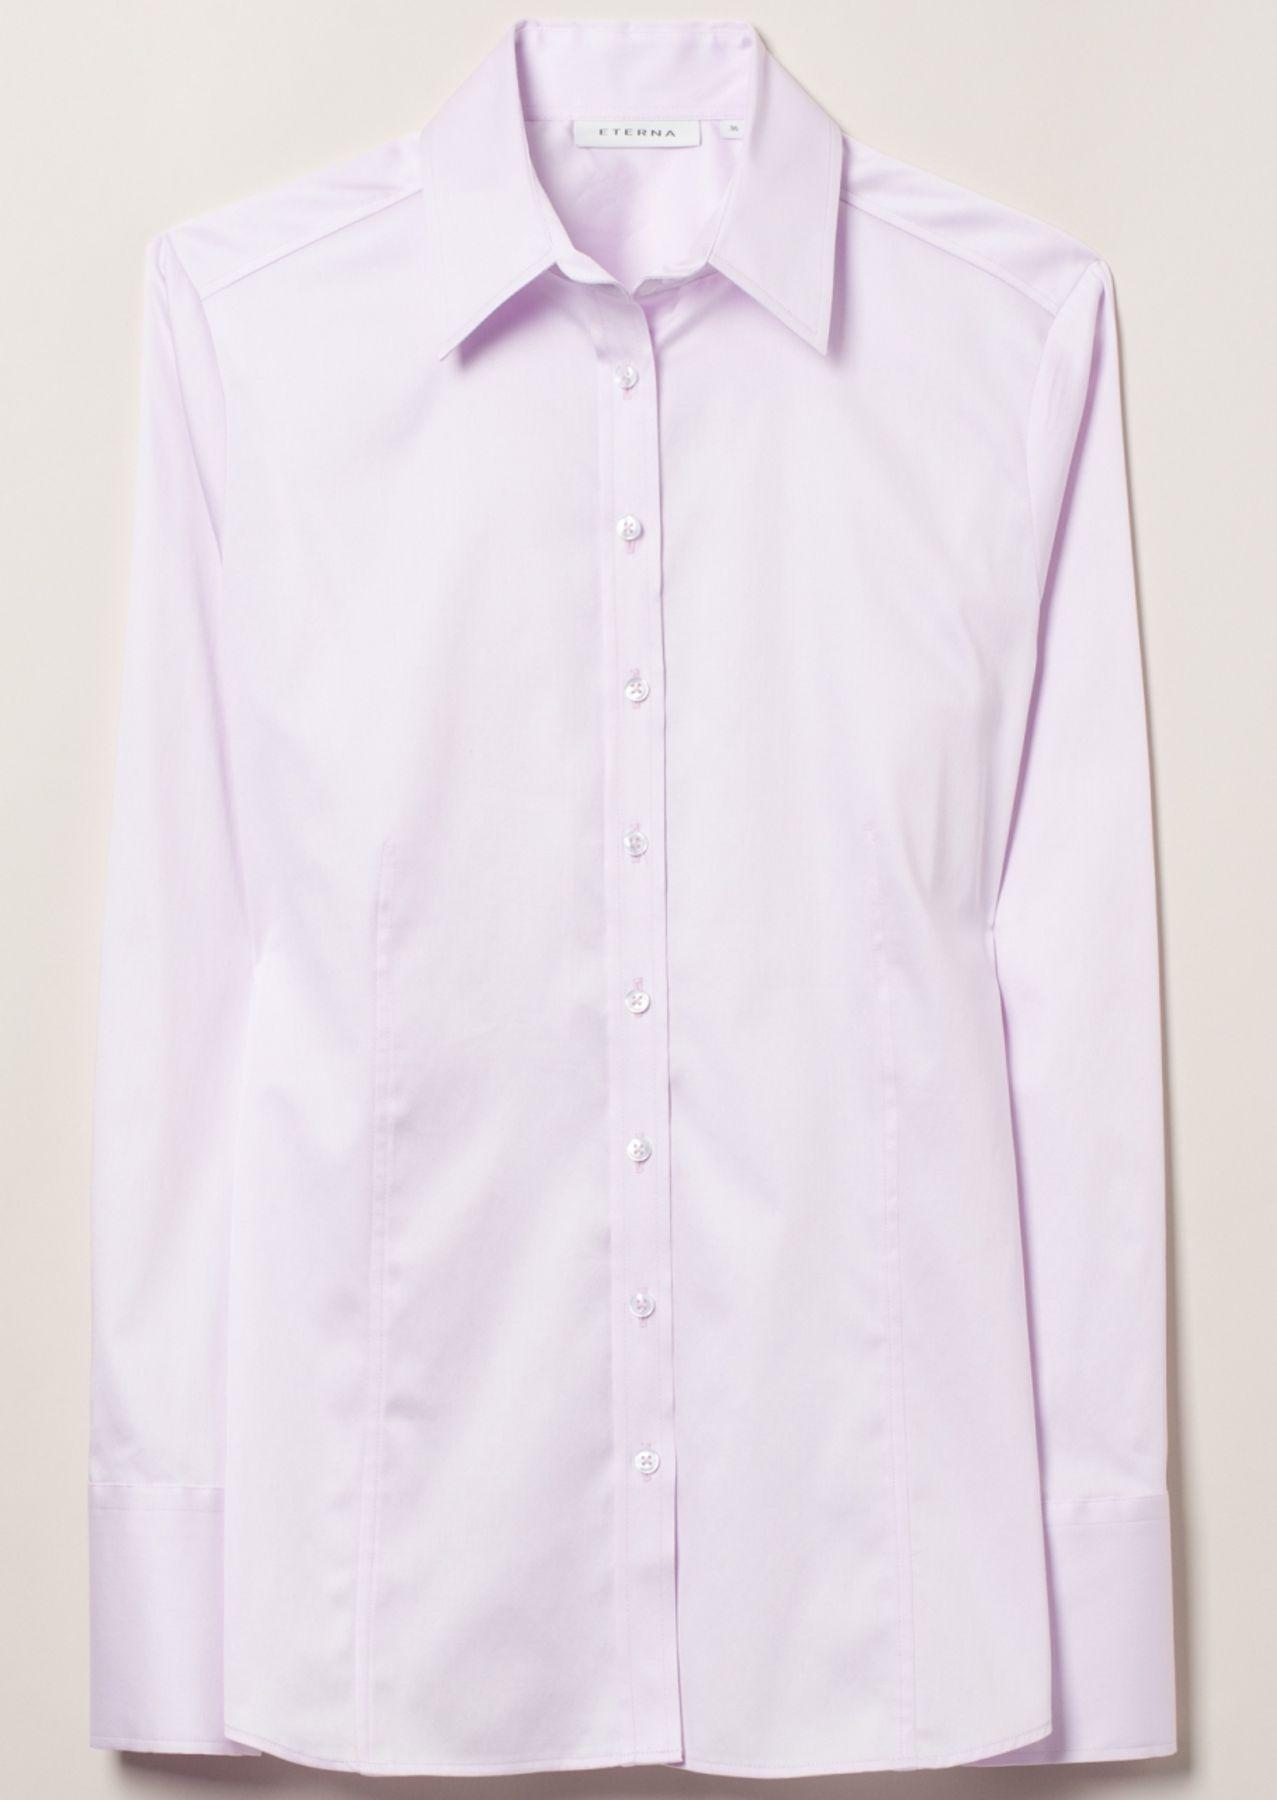 Eterna - Comfort Fit - Damen Langarm Bluse in Rosa (5352 D624) – Bild 5